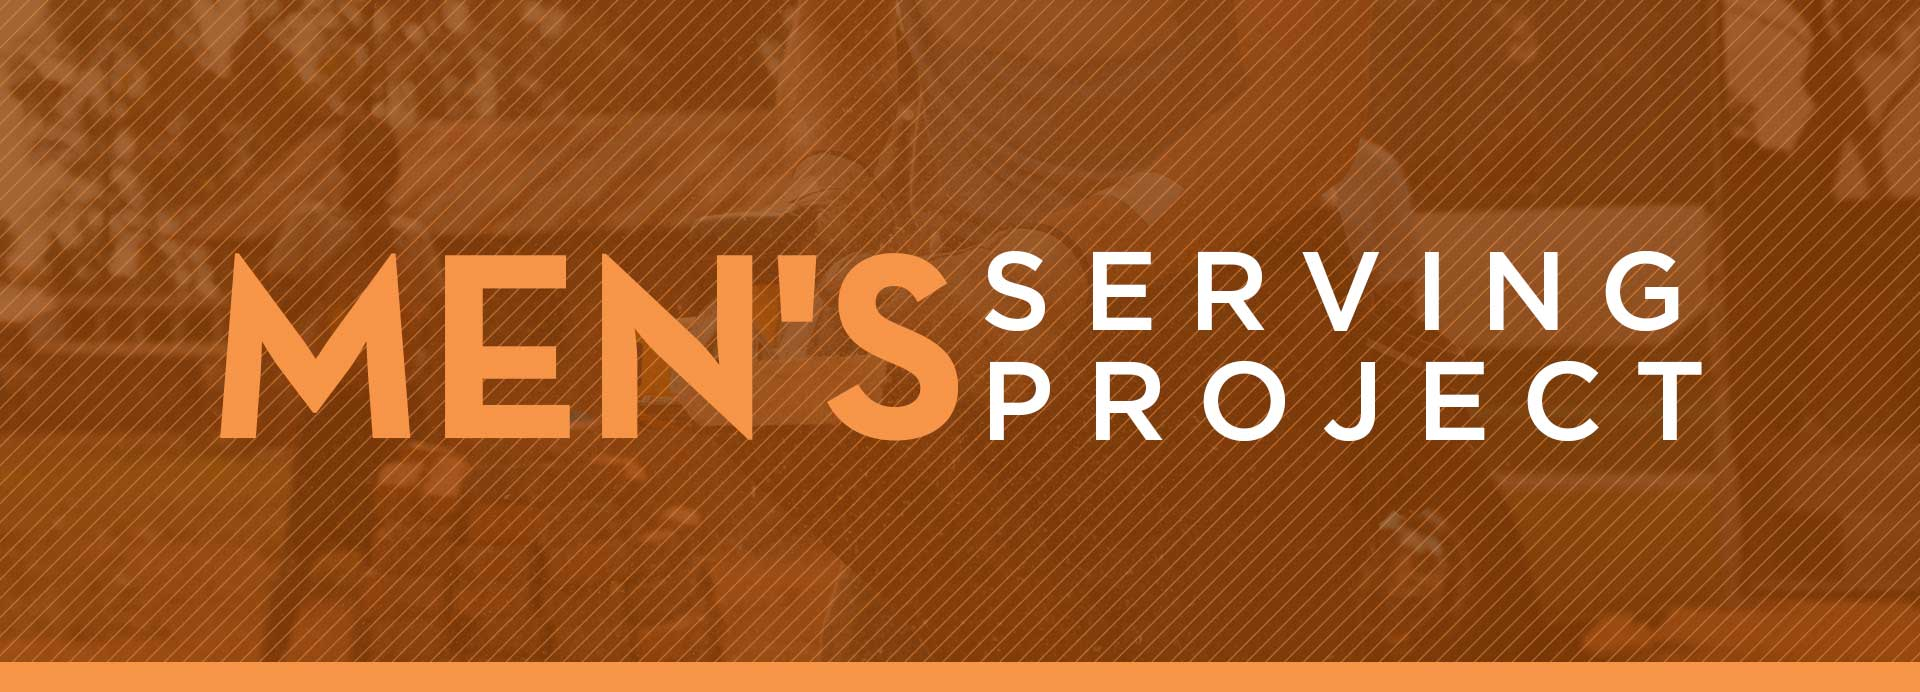 Men's-Serving-Project_1920x692.jpg